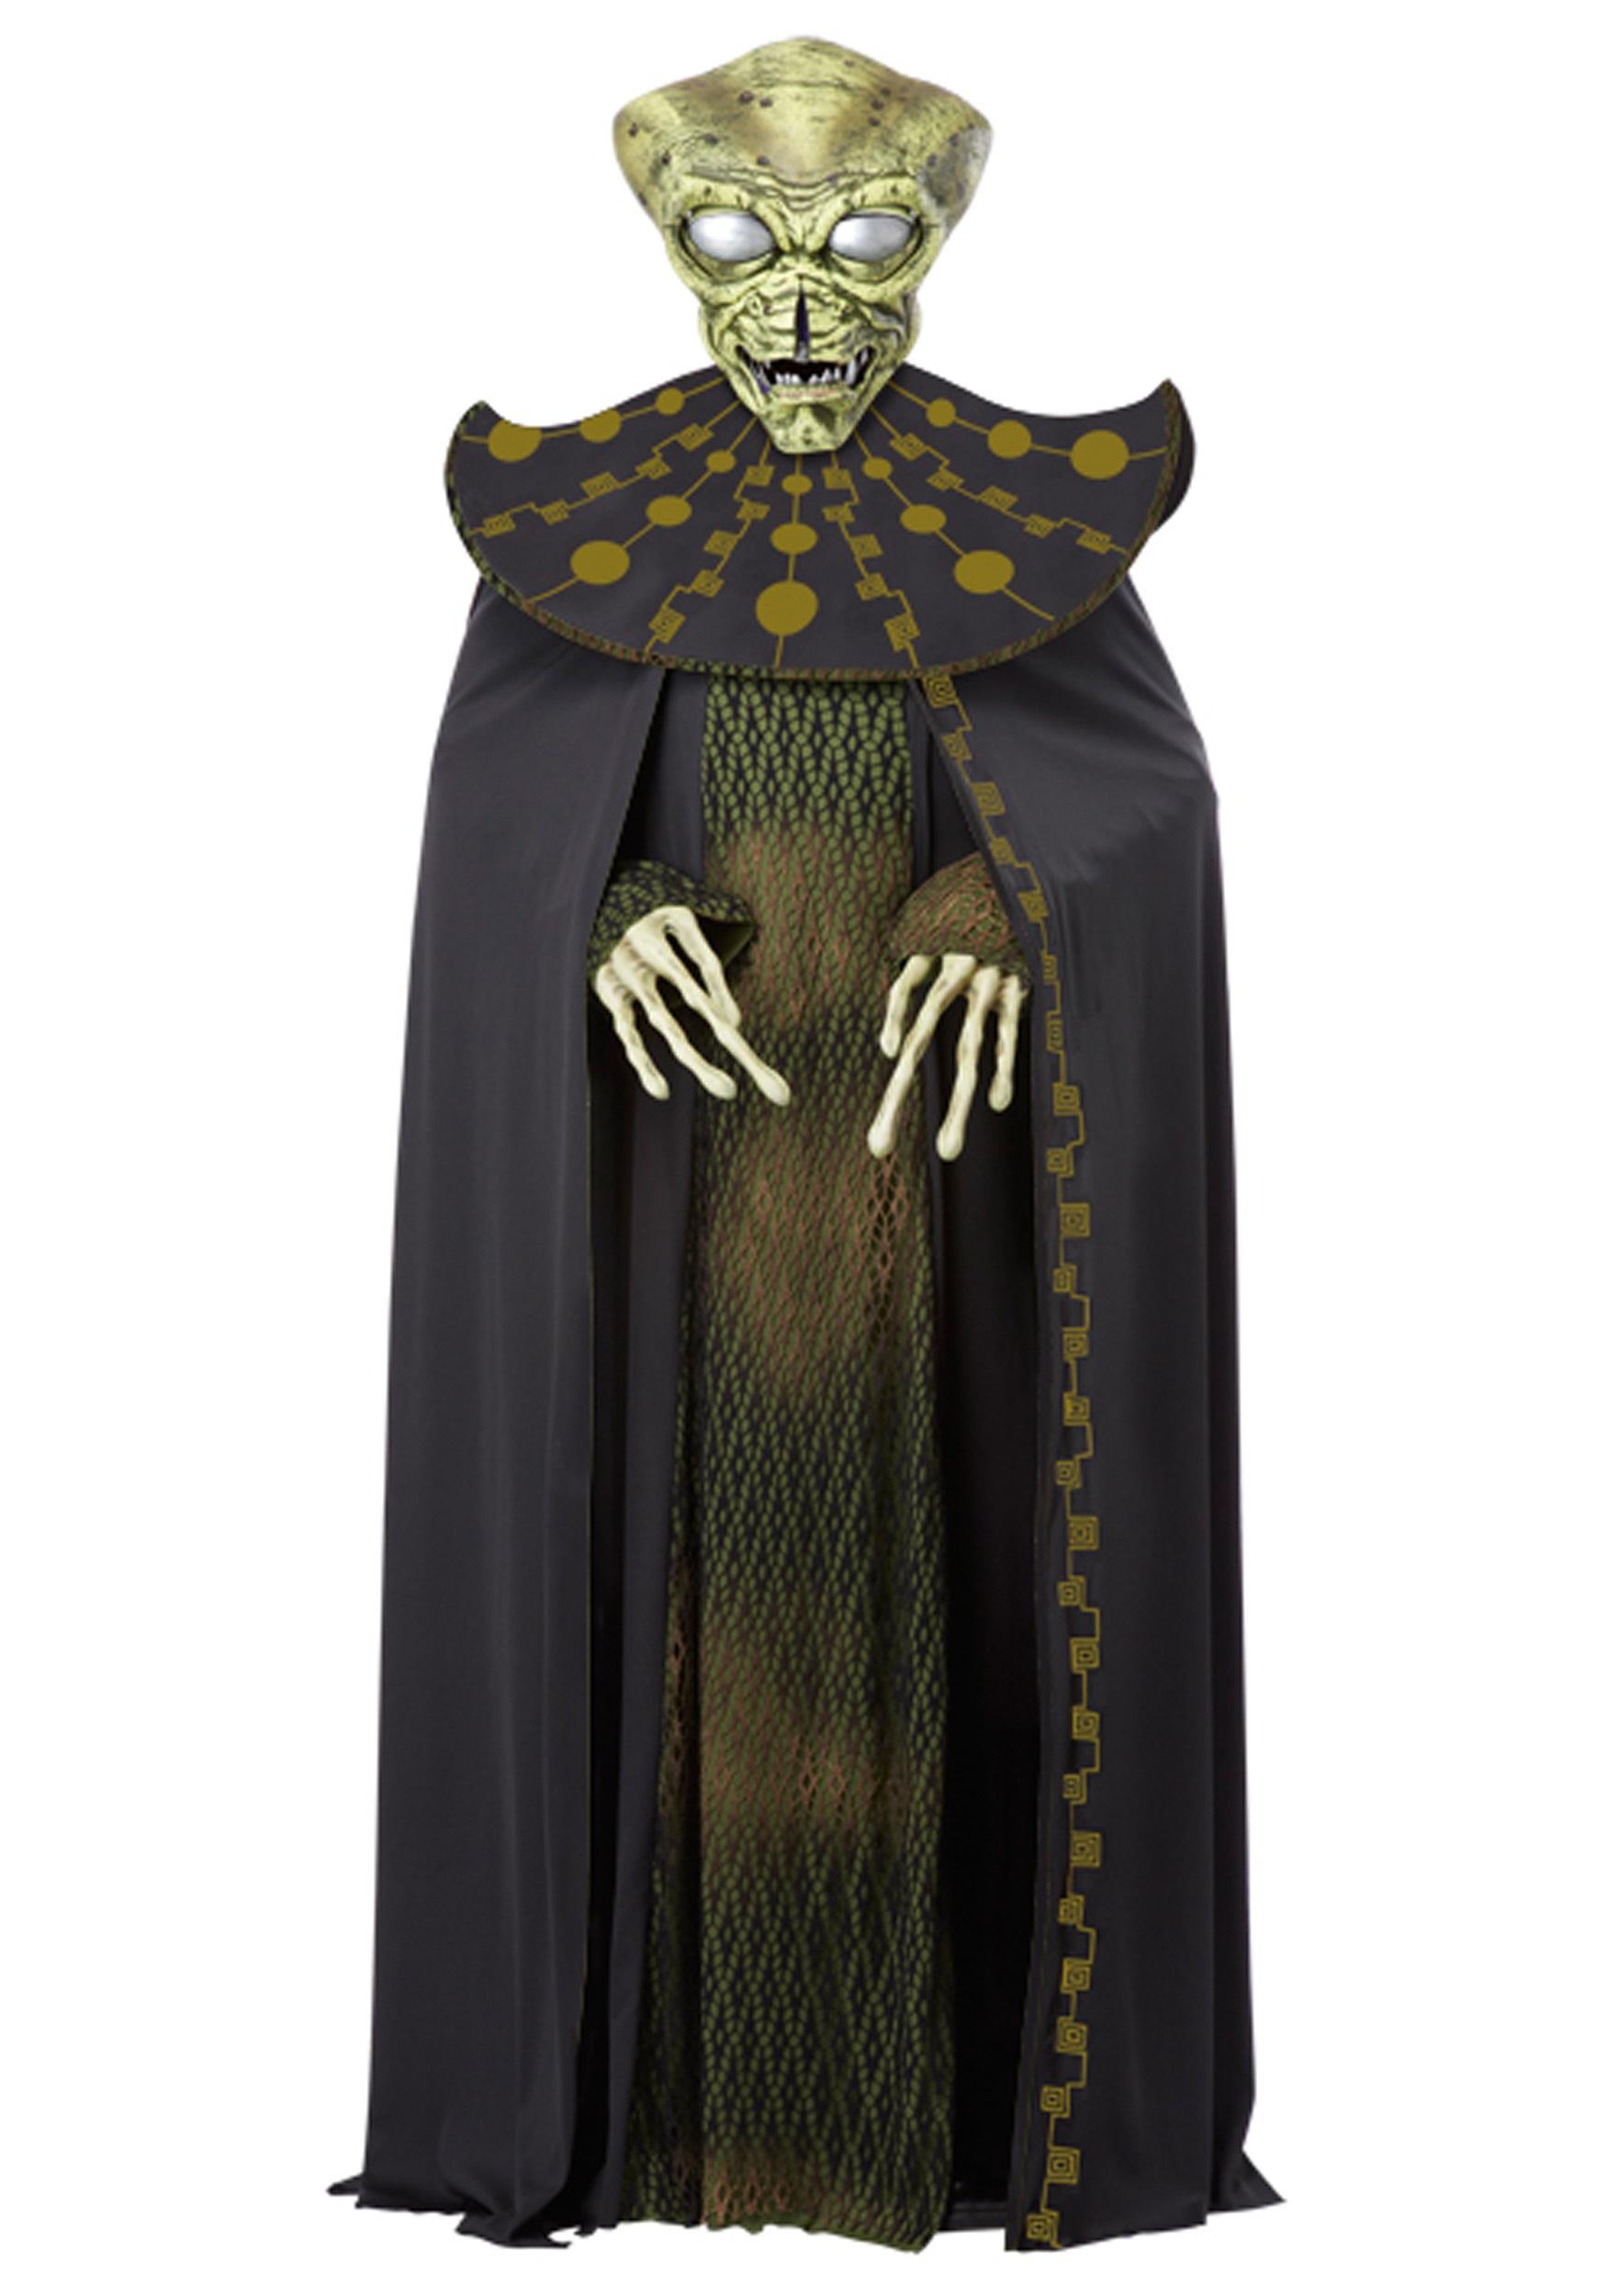 Grand Alien Adult Costume  sc 1 st  Halloween Costumes & Grand Alien Adult Costume - Halloween Costumes